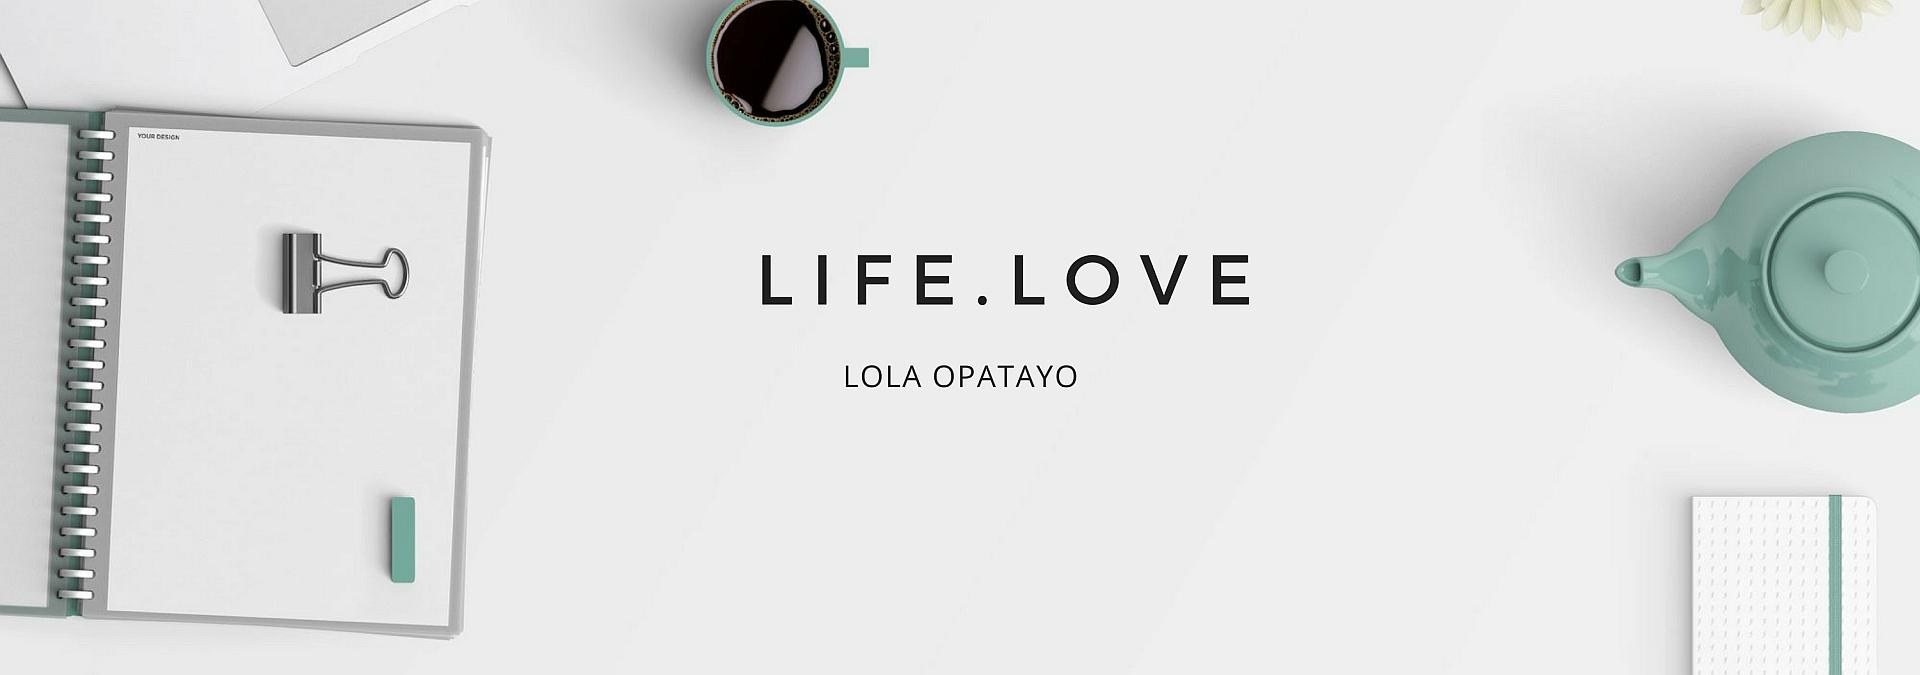 Lola Opatayo